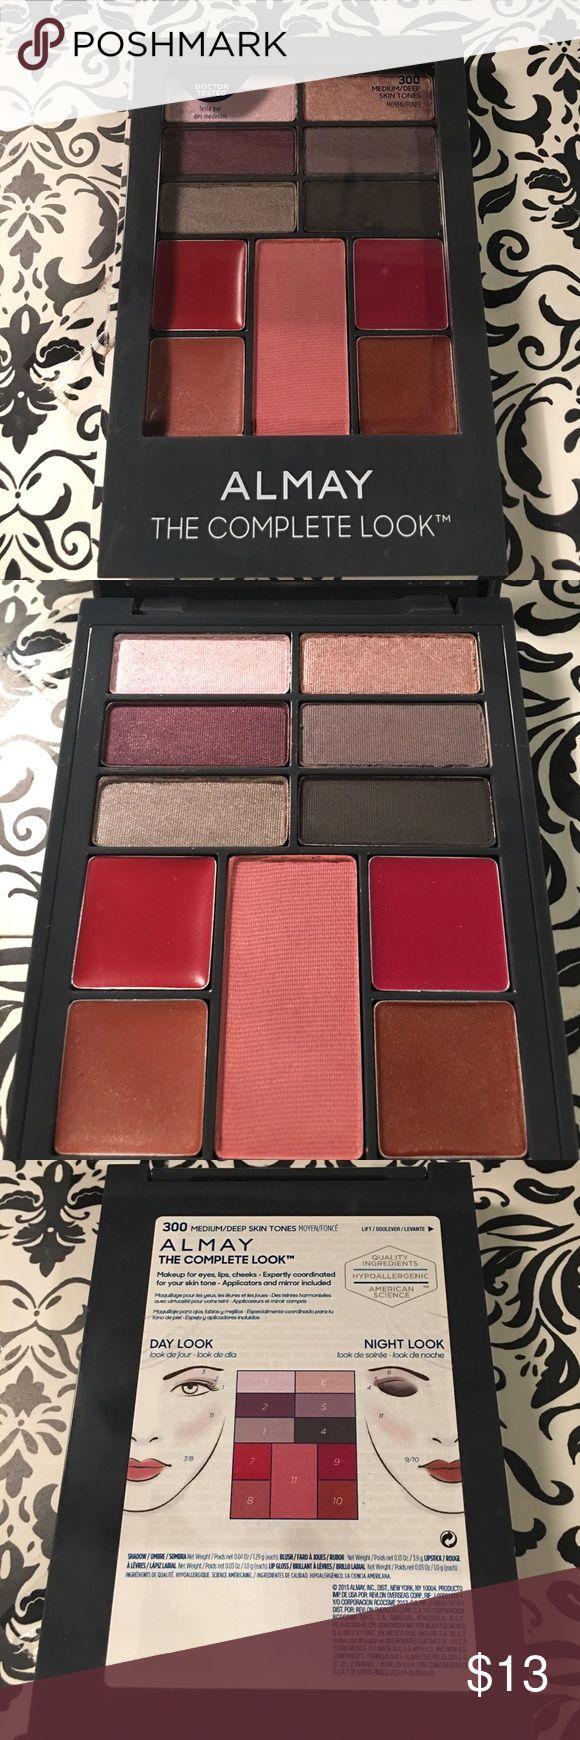 Almay The Complete Look Makeup Palette 4.0 oz. New Almay The Complete Look Makeup Palette 4.0 oz.        300 Medium/Deep Skin Tones Almay Makeup